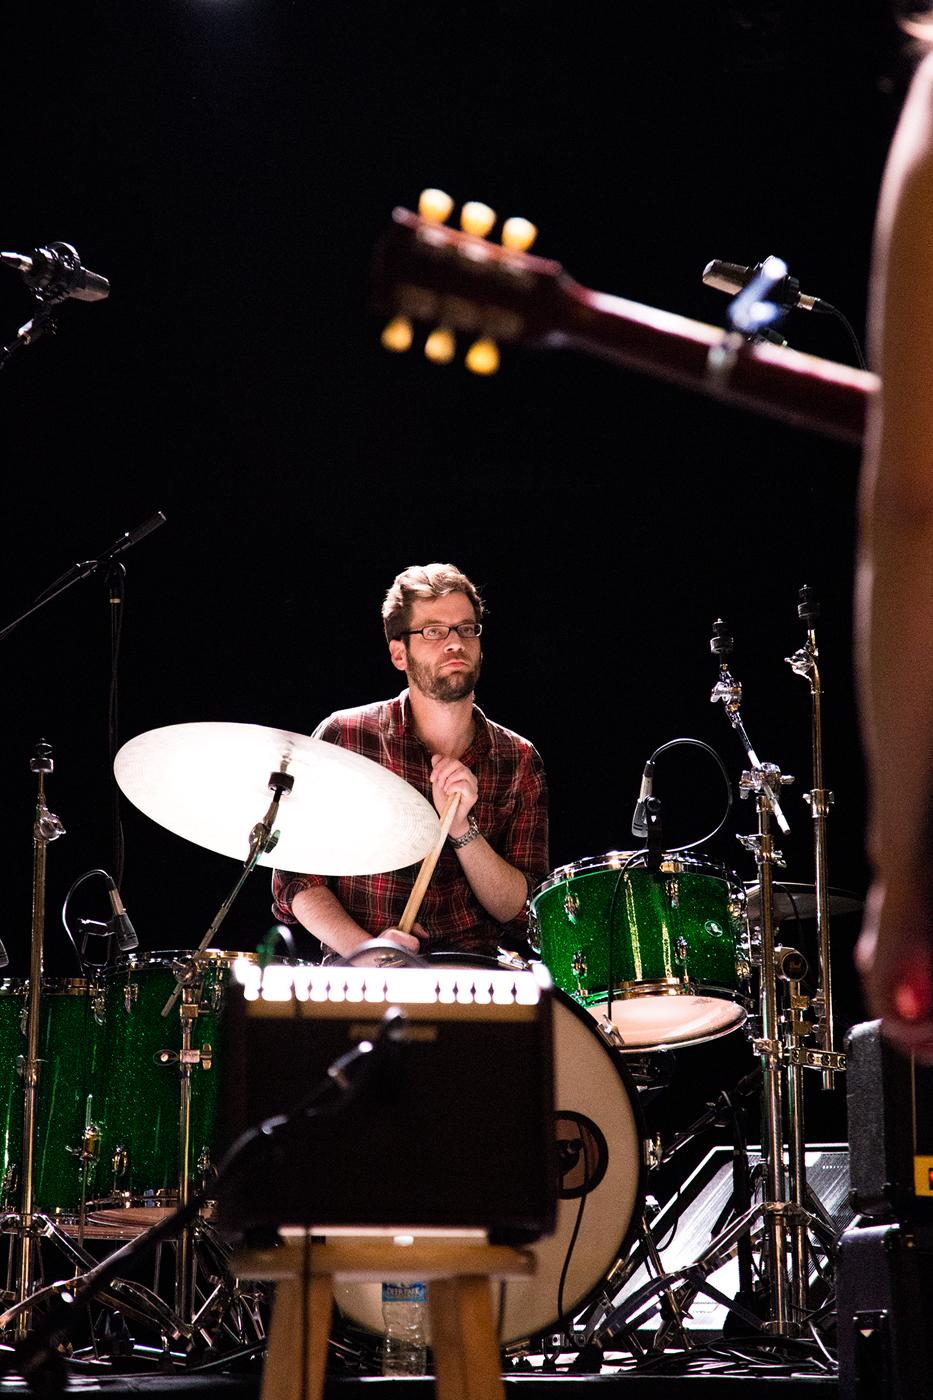 Drummer Kevin Etzler